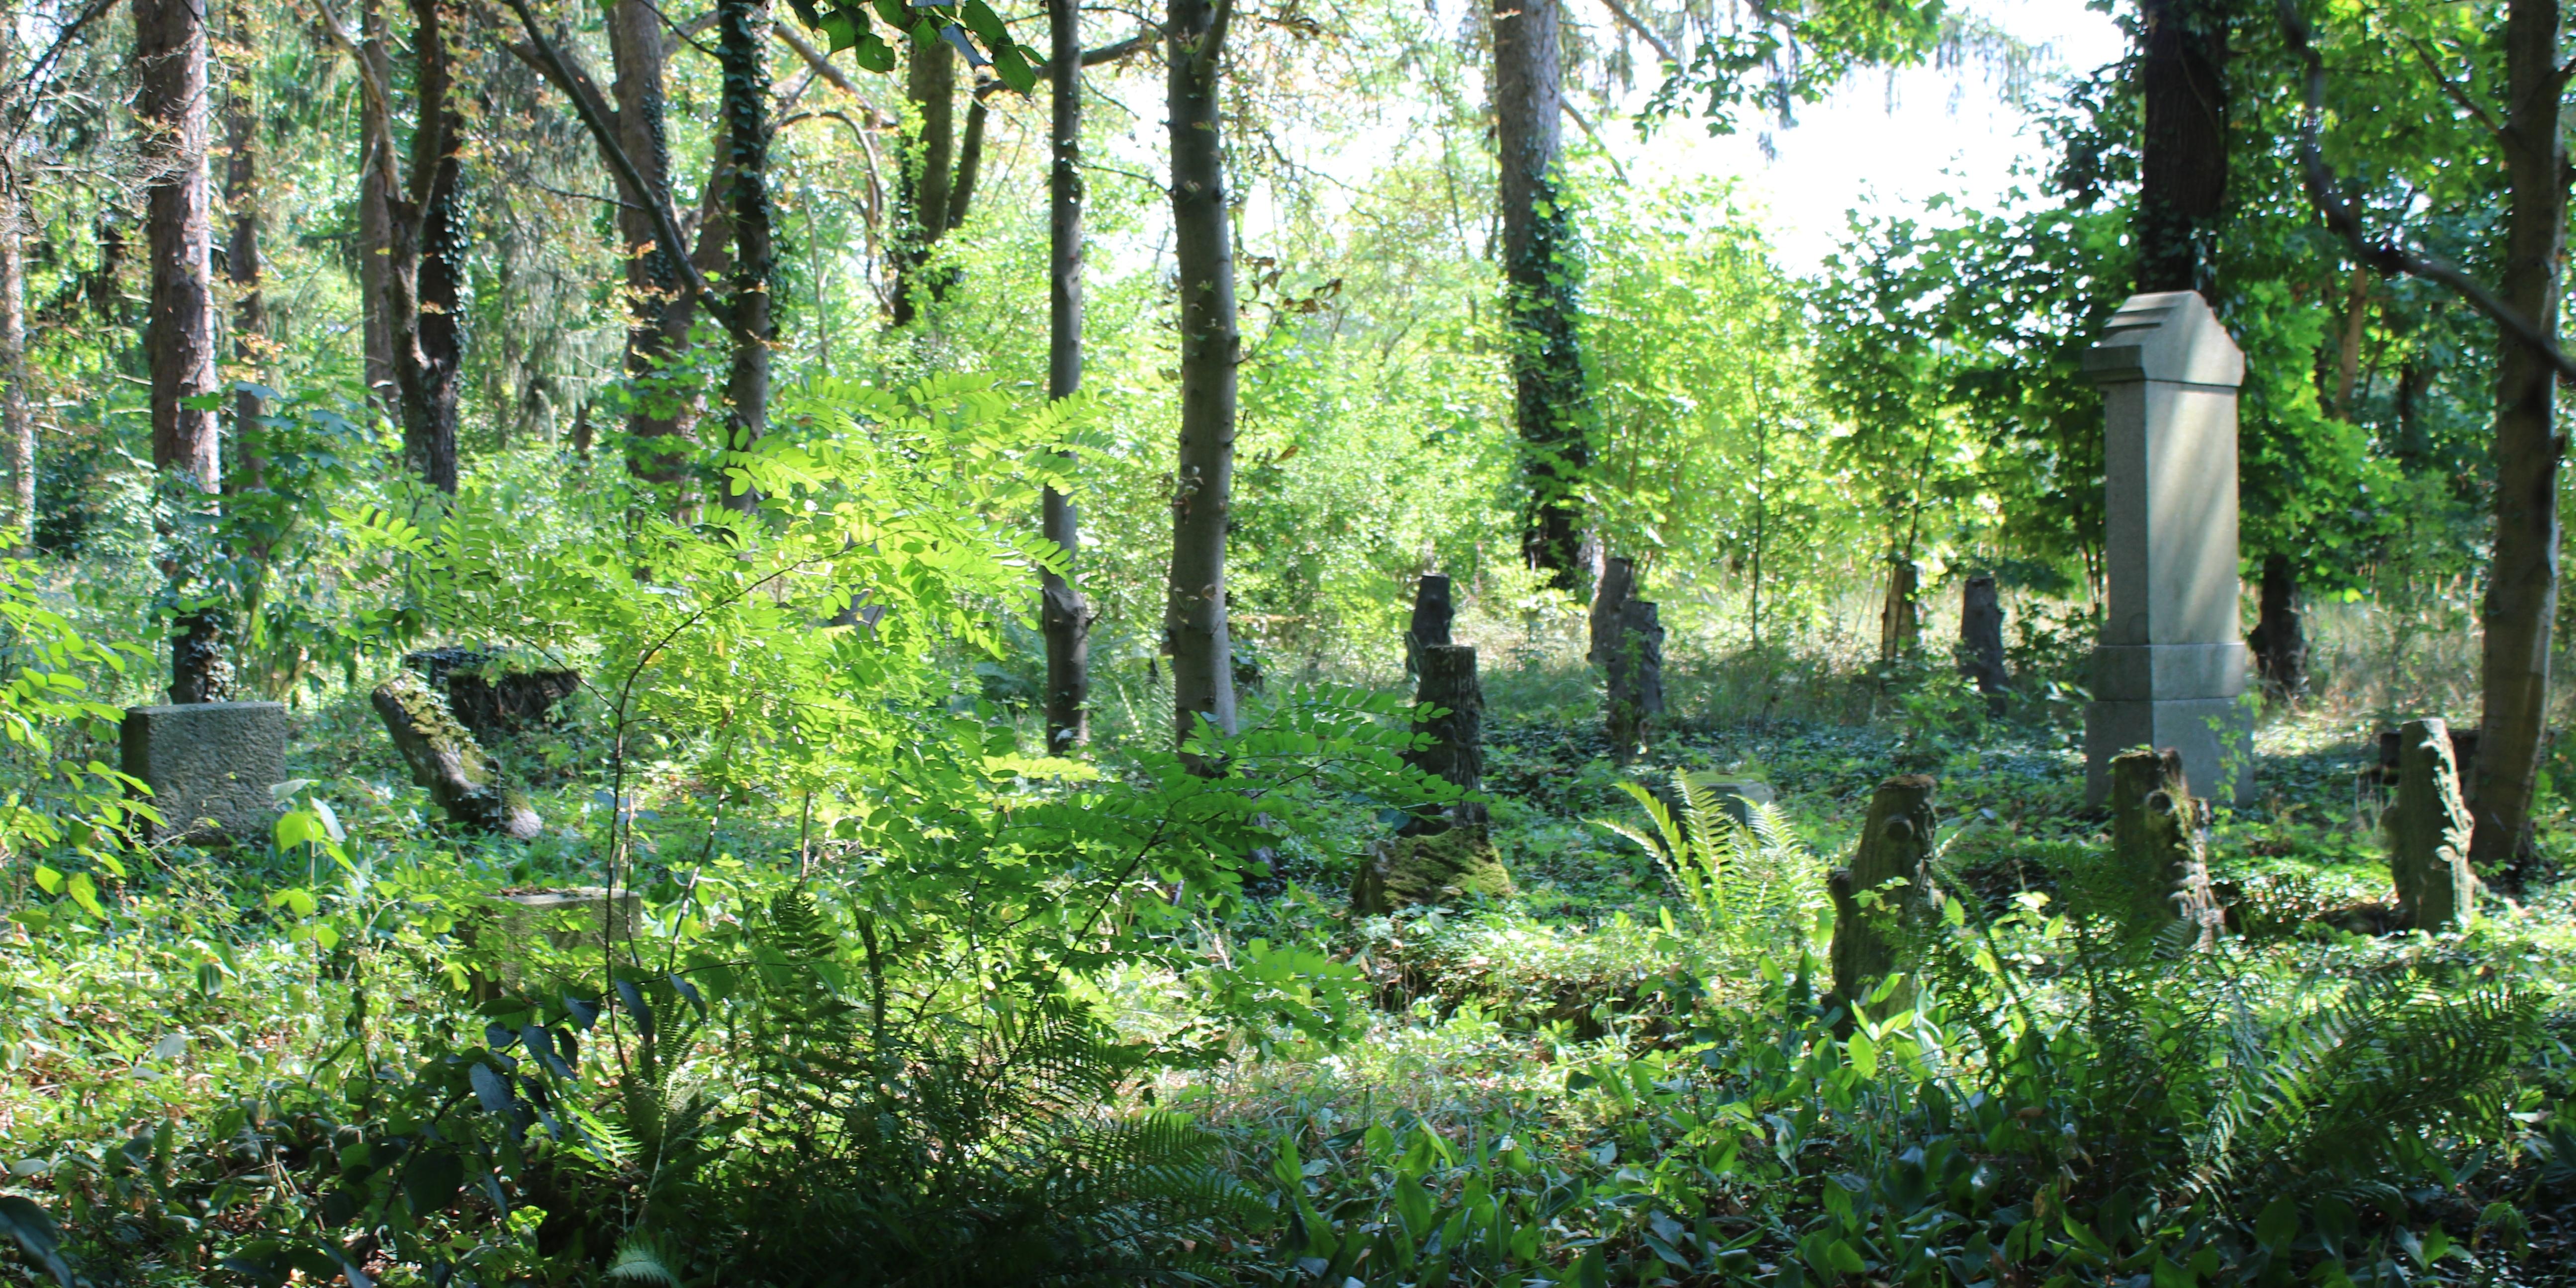 Friedhof Pinnow Weststernberg Neumark Dilibra Ahnenforschung Blog - Weststernberg, Pinnow, Neumark Tour 2018, Neumark, Friedhof, Codogny, Böhme